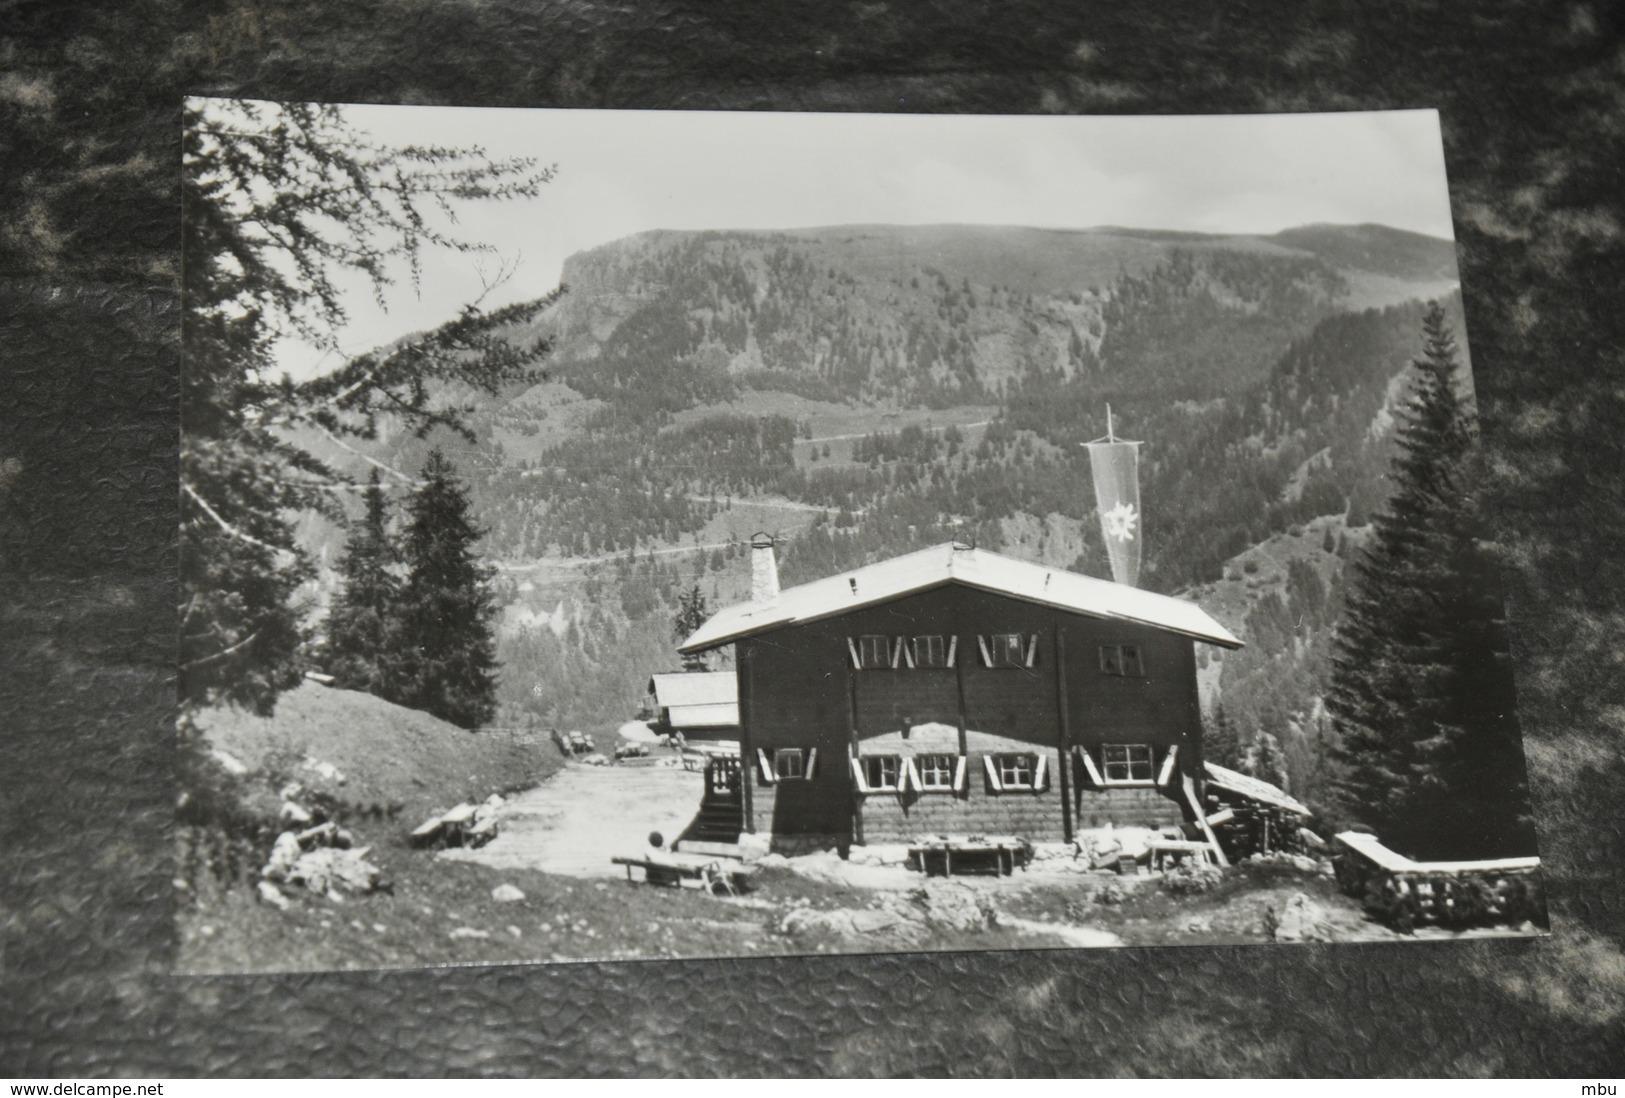 3104  Alpenvereins Hütte Schlernbödele - Sektion Bozen - Italy